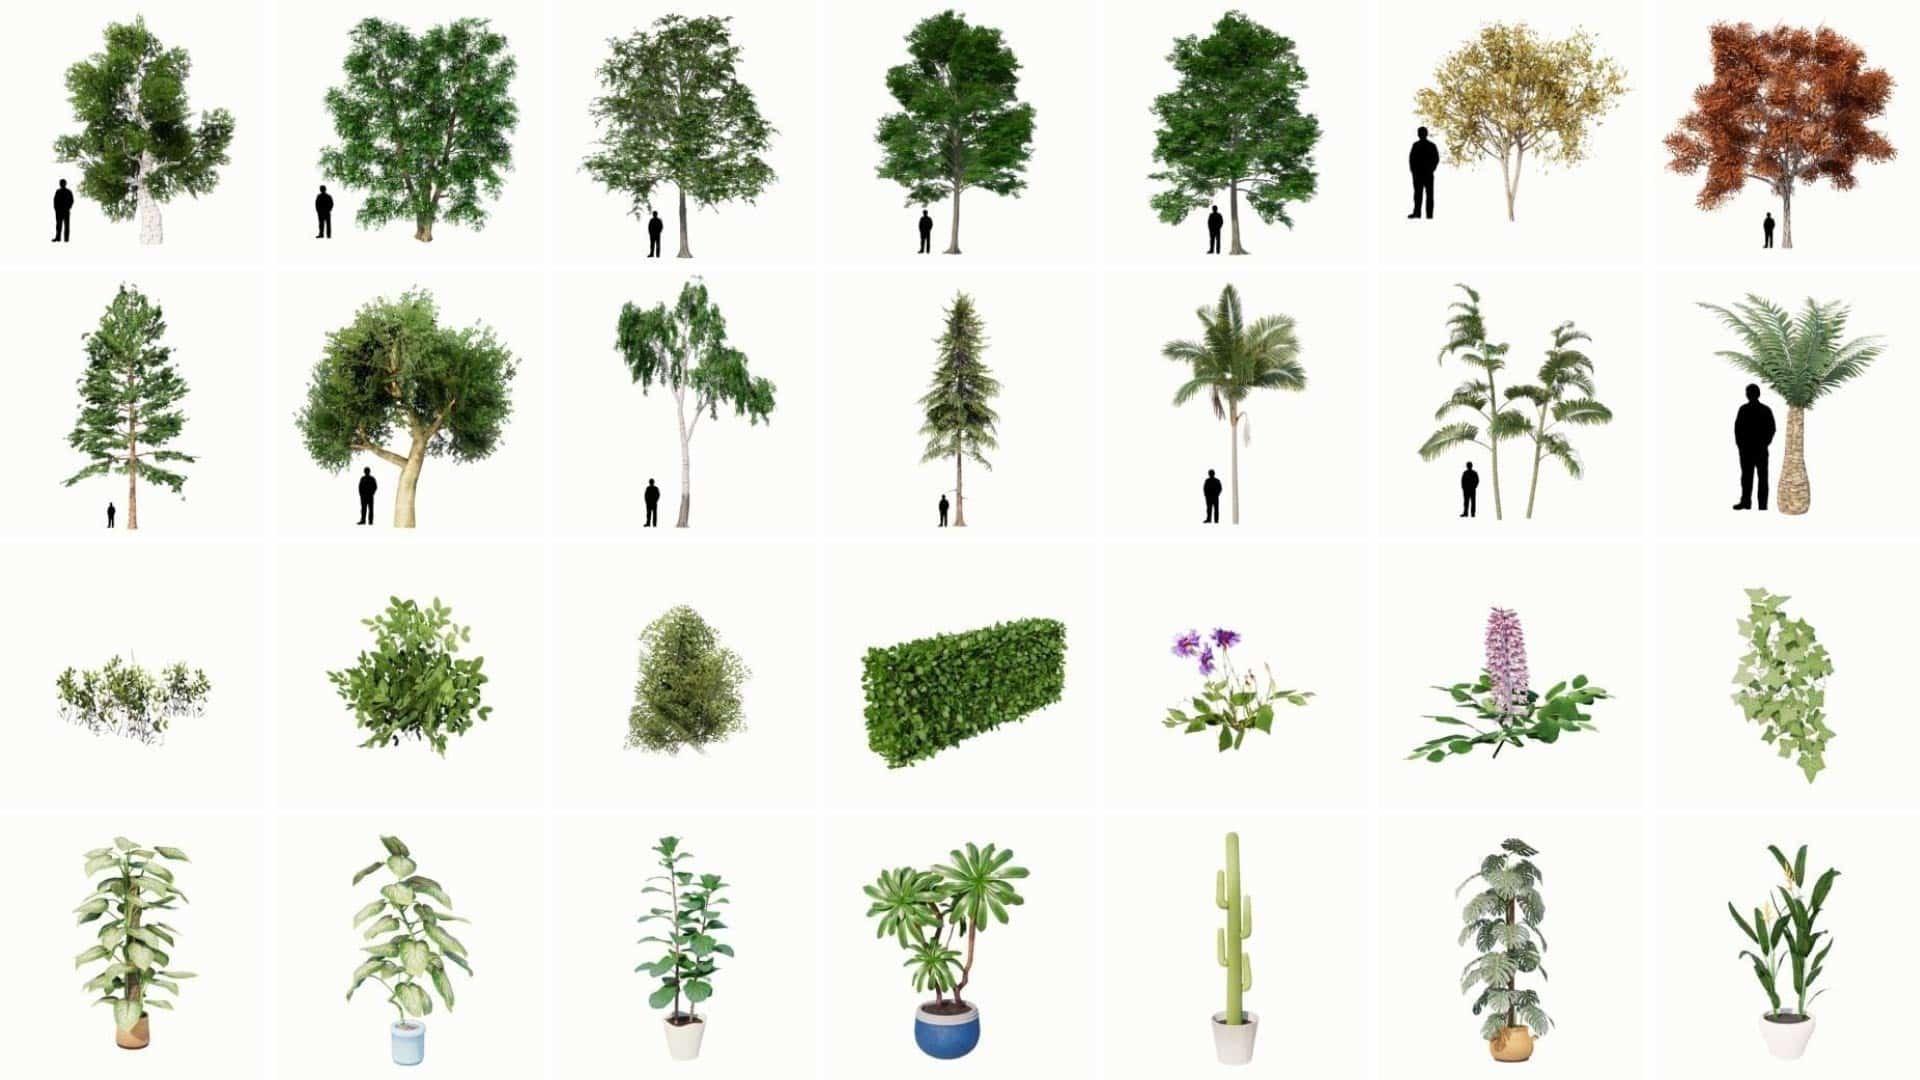 vegetation_optimized-1